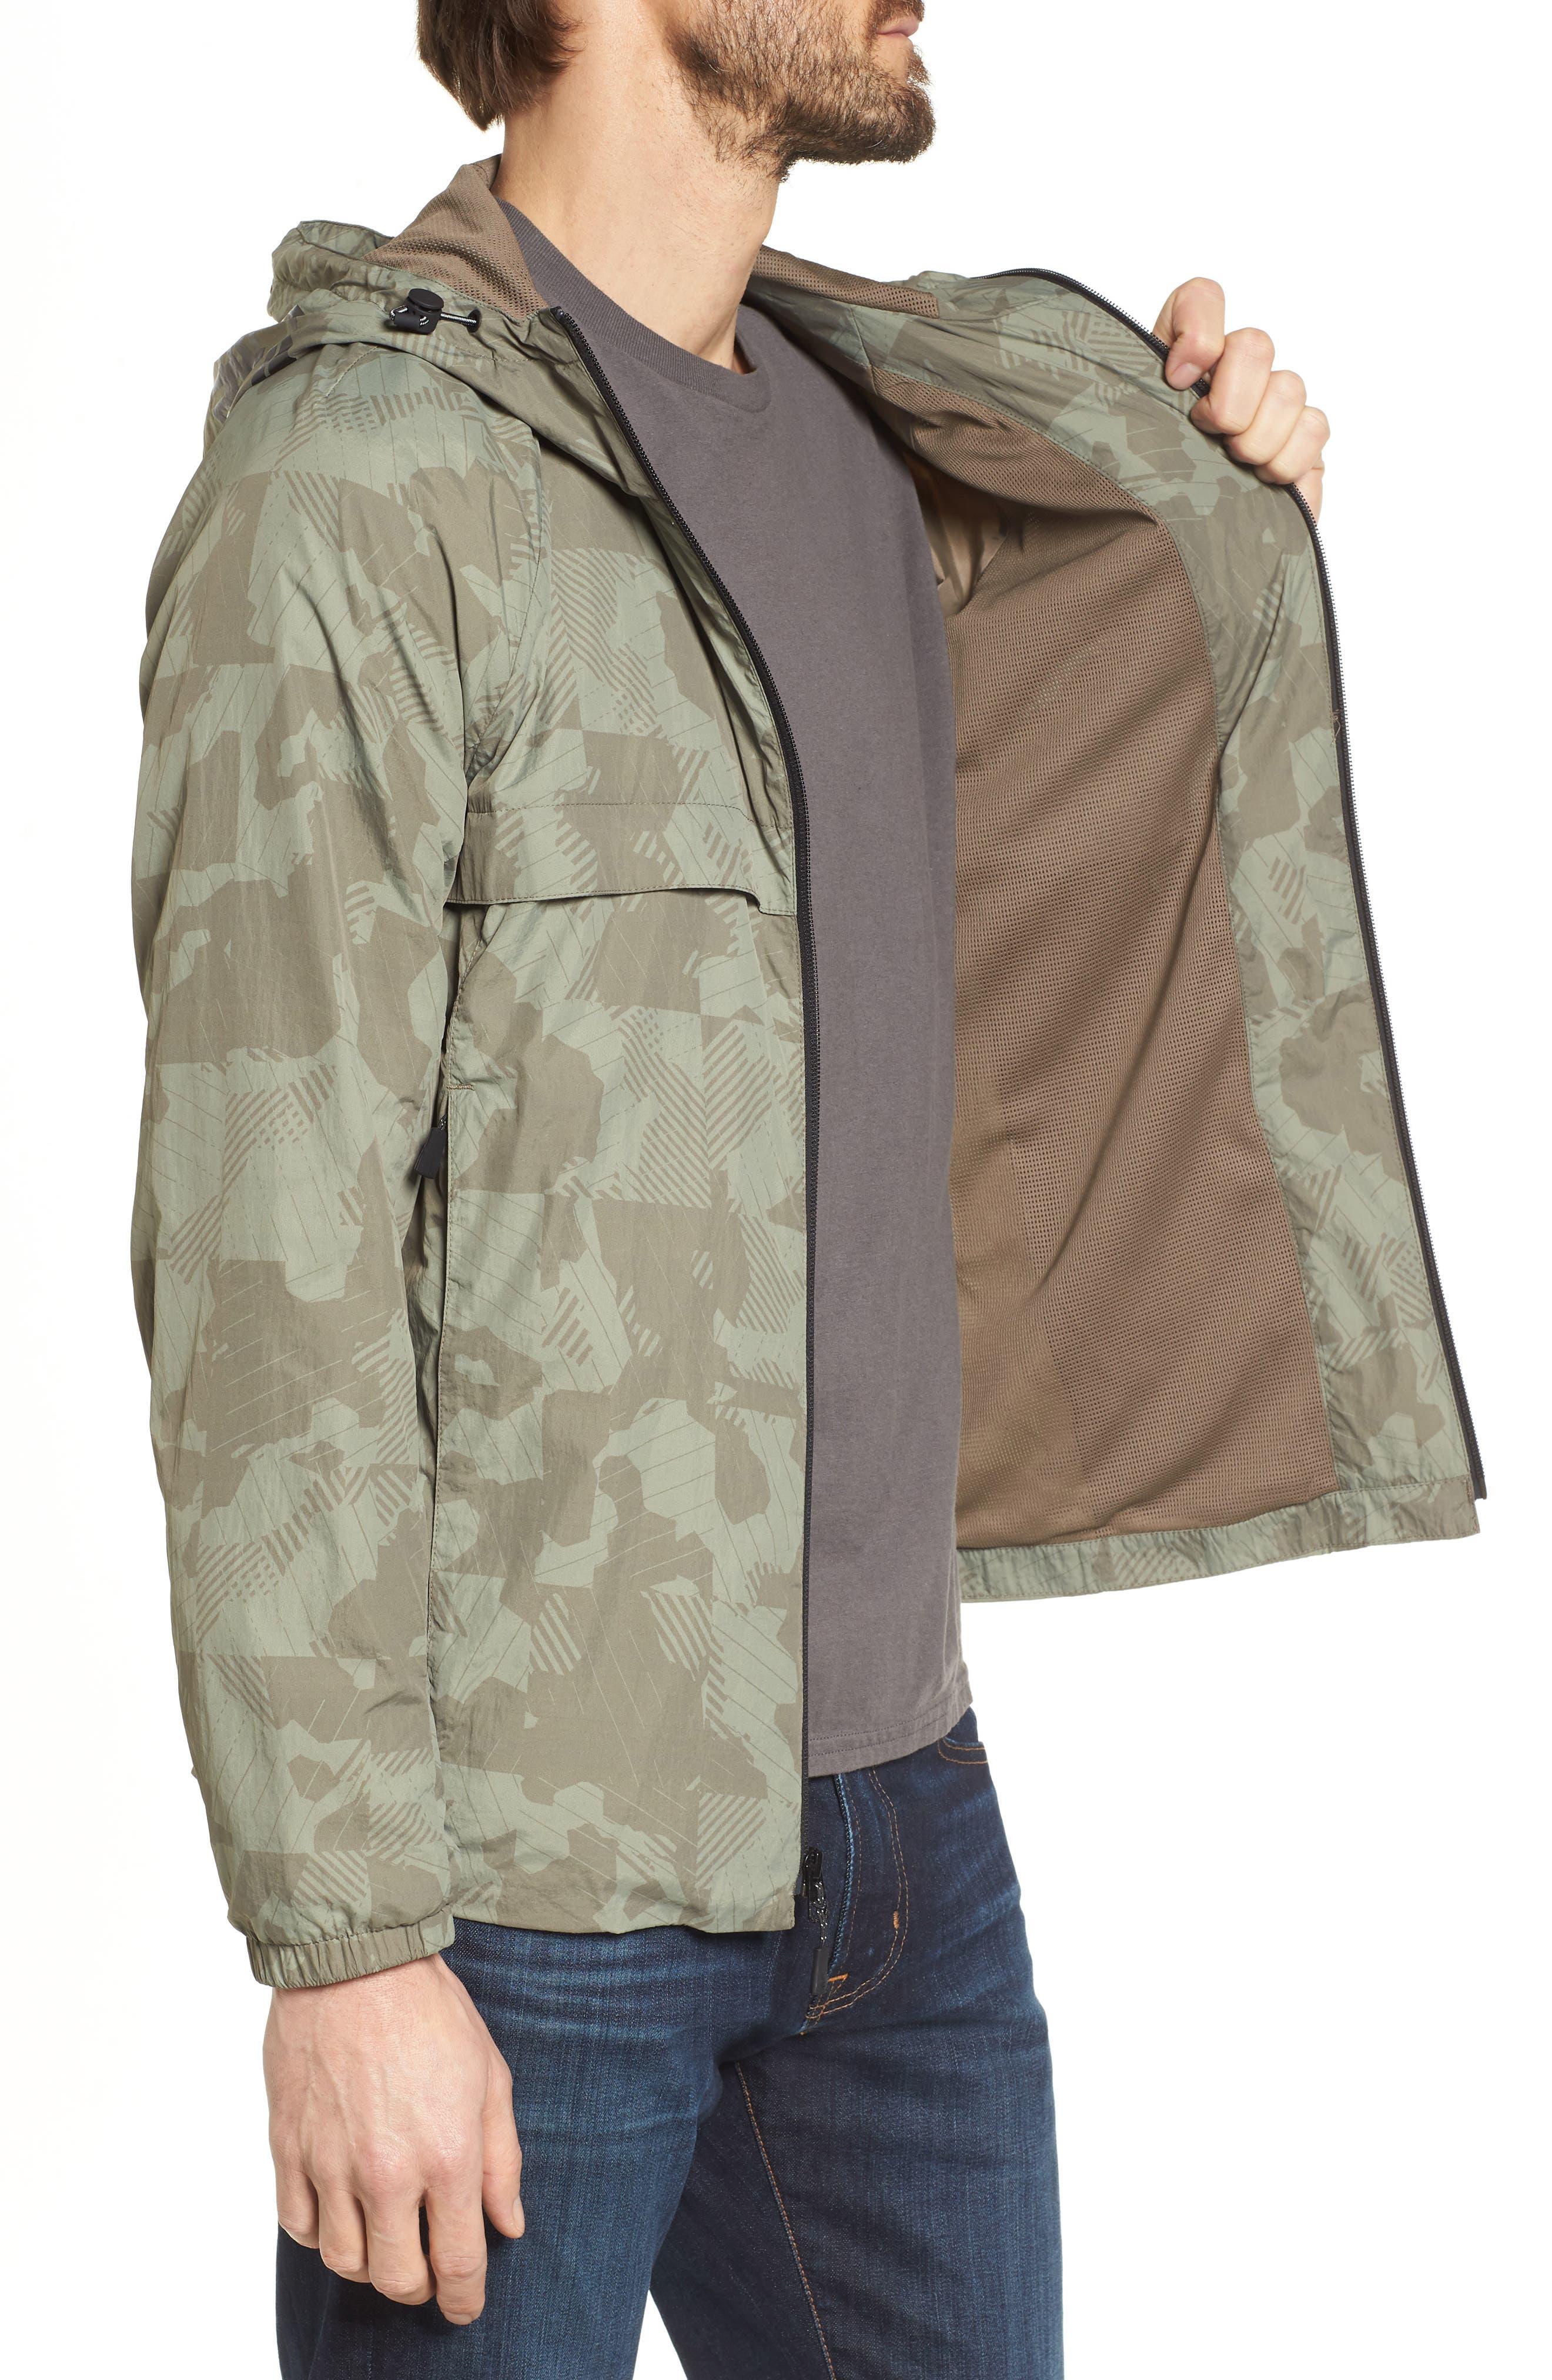 Camo Windbreaker Jacket,                             Alternate thumbnail 3, color,                             Bungee Cord Camo